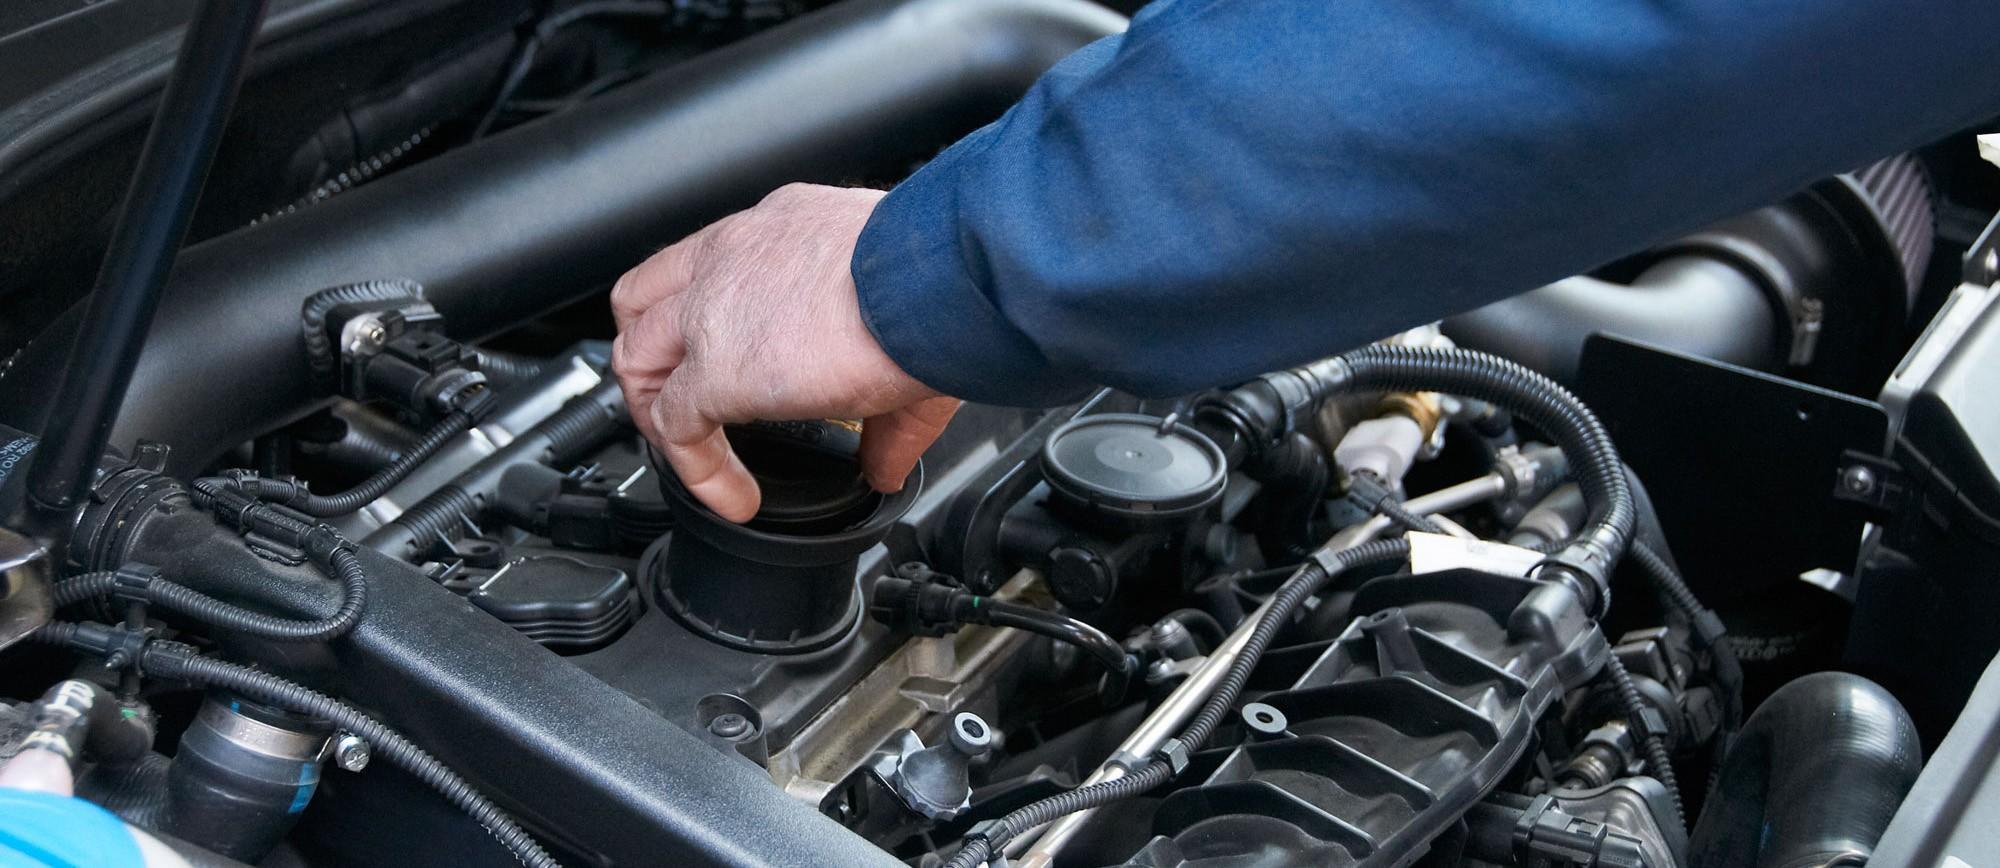 Volkswagen Atlas Maintenance Milestones Archer Vw 2007 Camry Fuel Filter Location